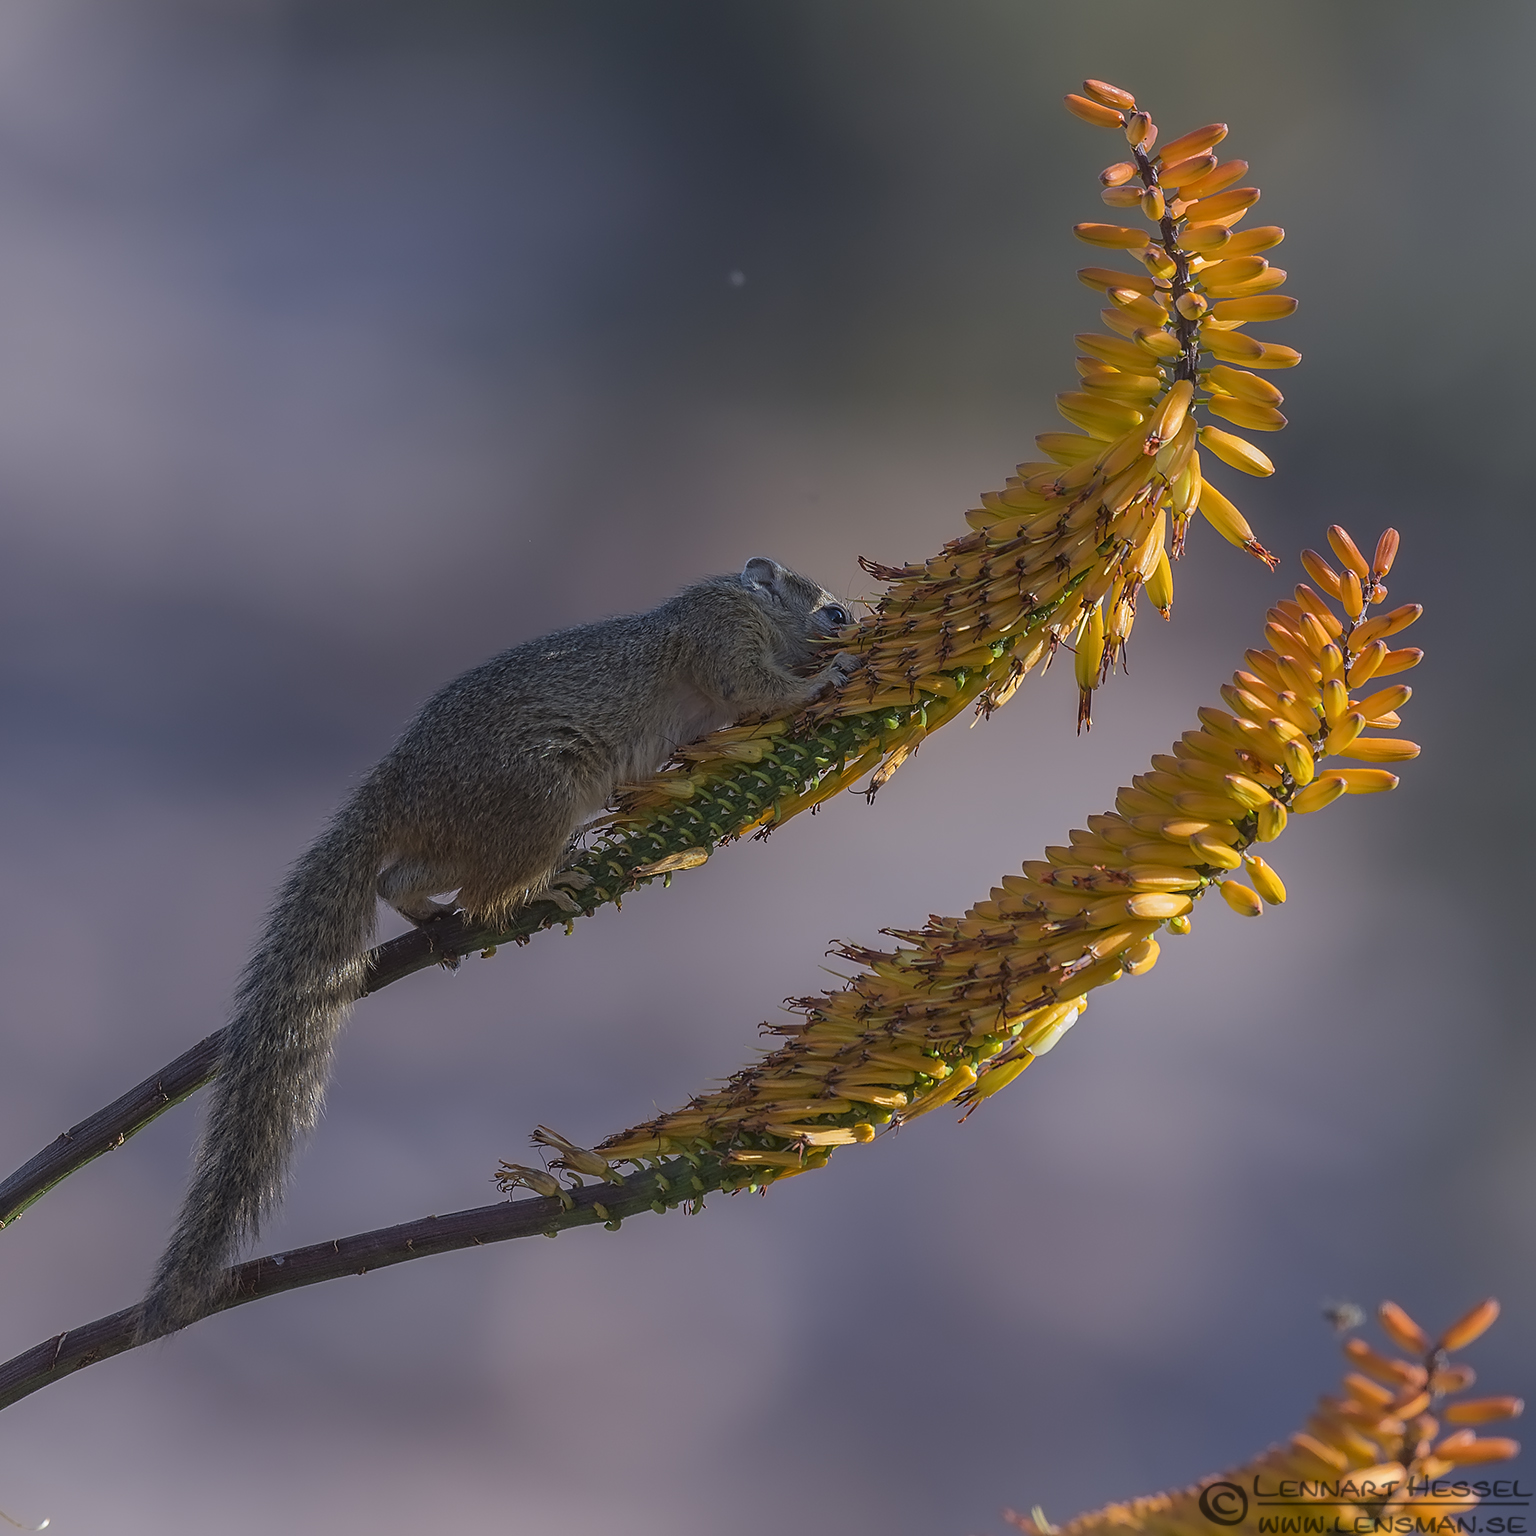 Ground Squirrel Kruger National Park South Africa